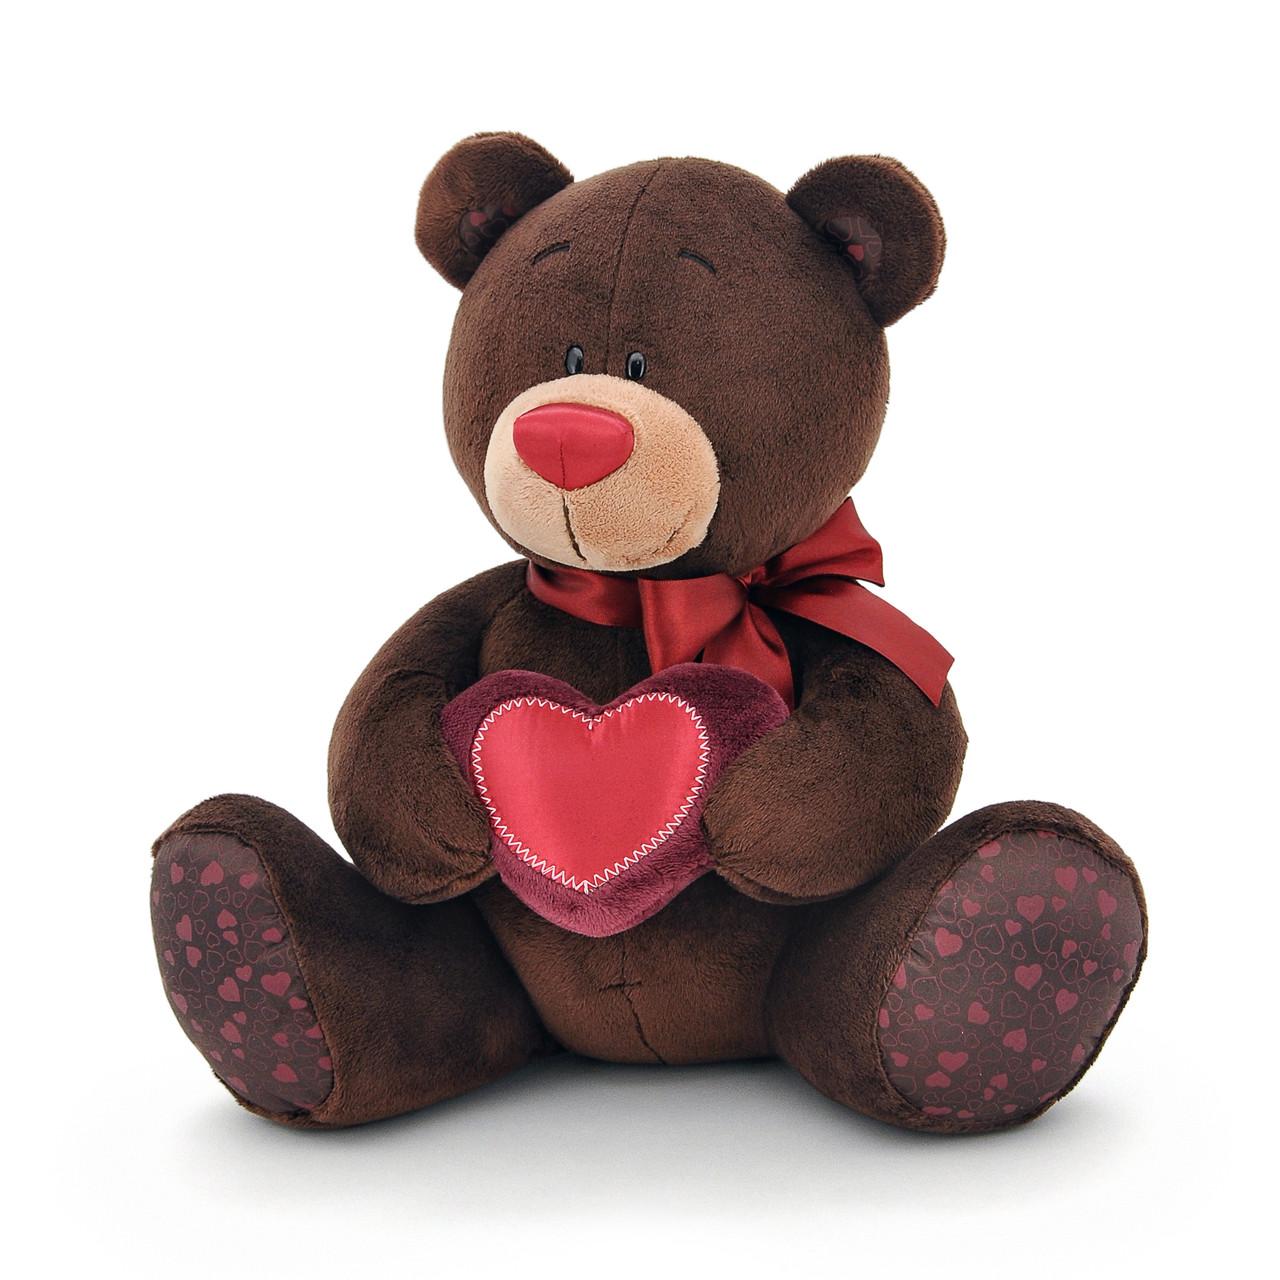 Мягкая игрушка «Orange» (C003/25) медвежонок Choco  с сердечком сидячий, 25 см